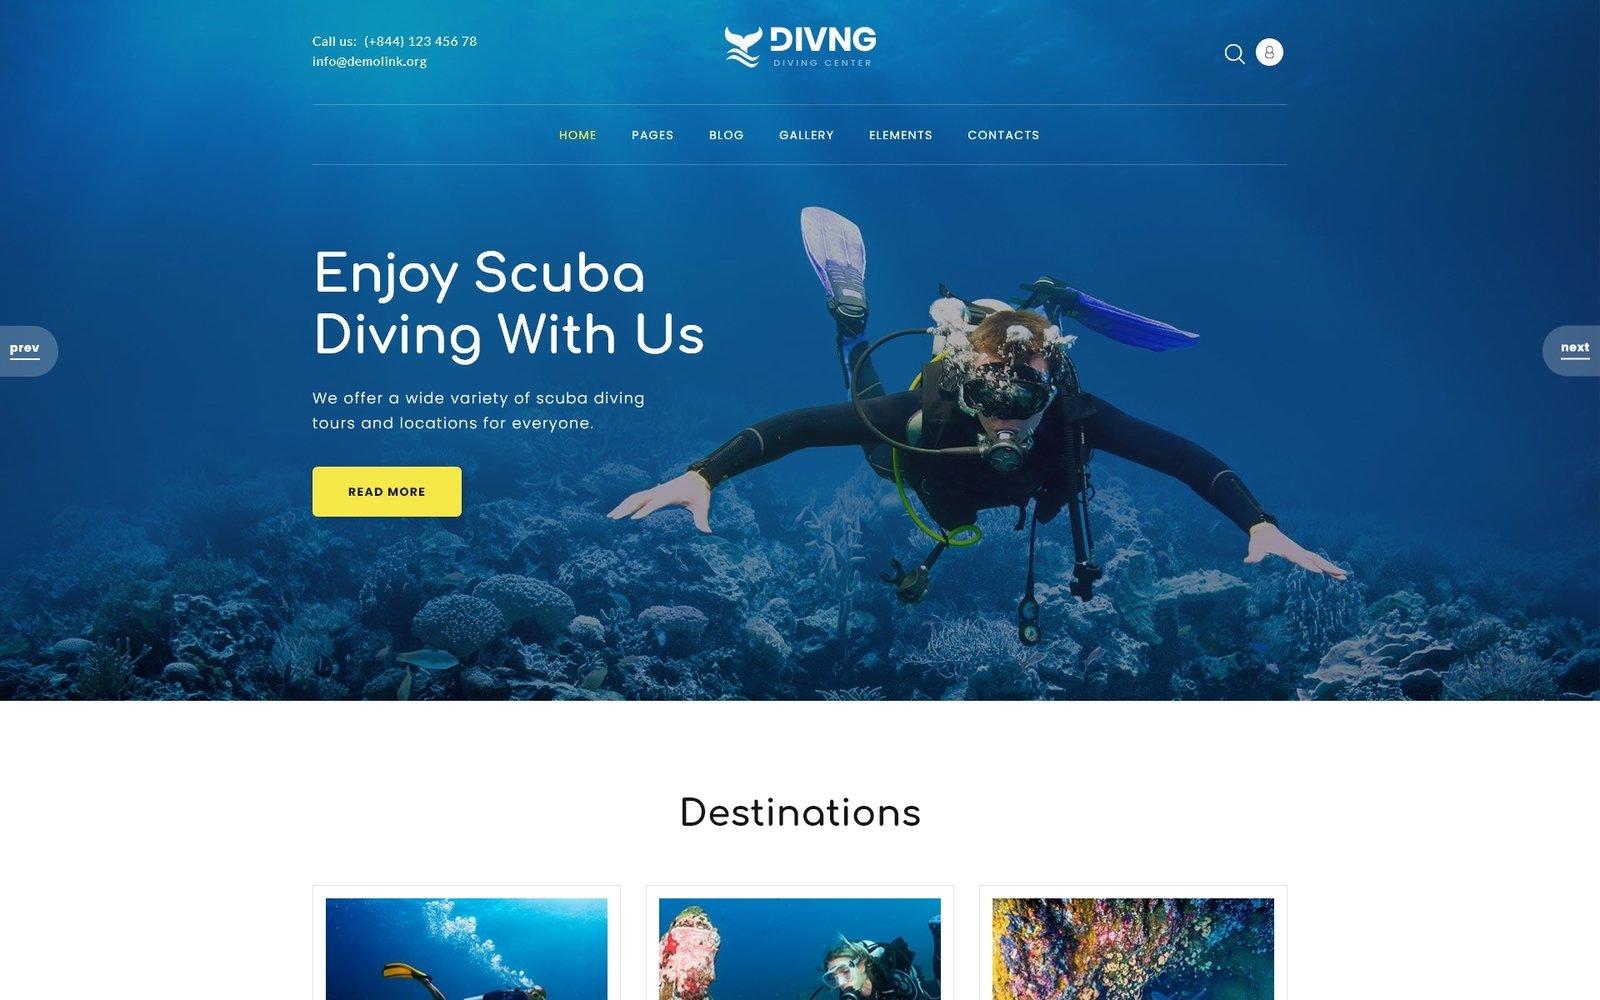 Responsywny szablon Joomla Divng - Diving Responsive Modern #83528 - zrzut ekranu